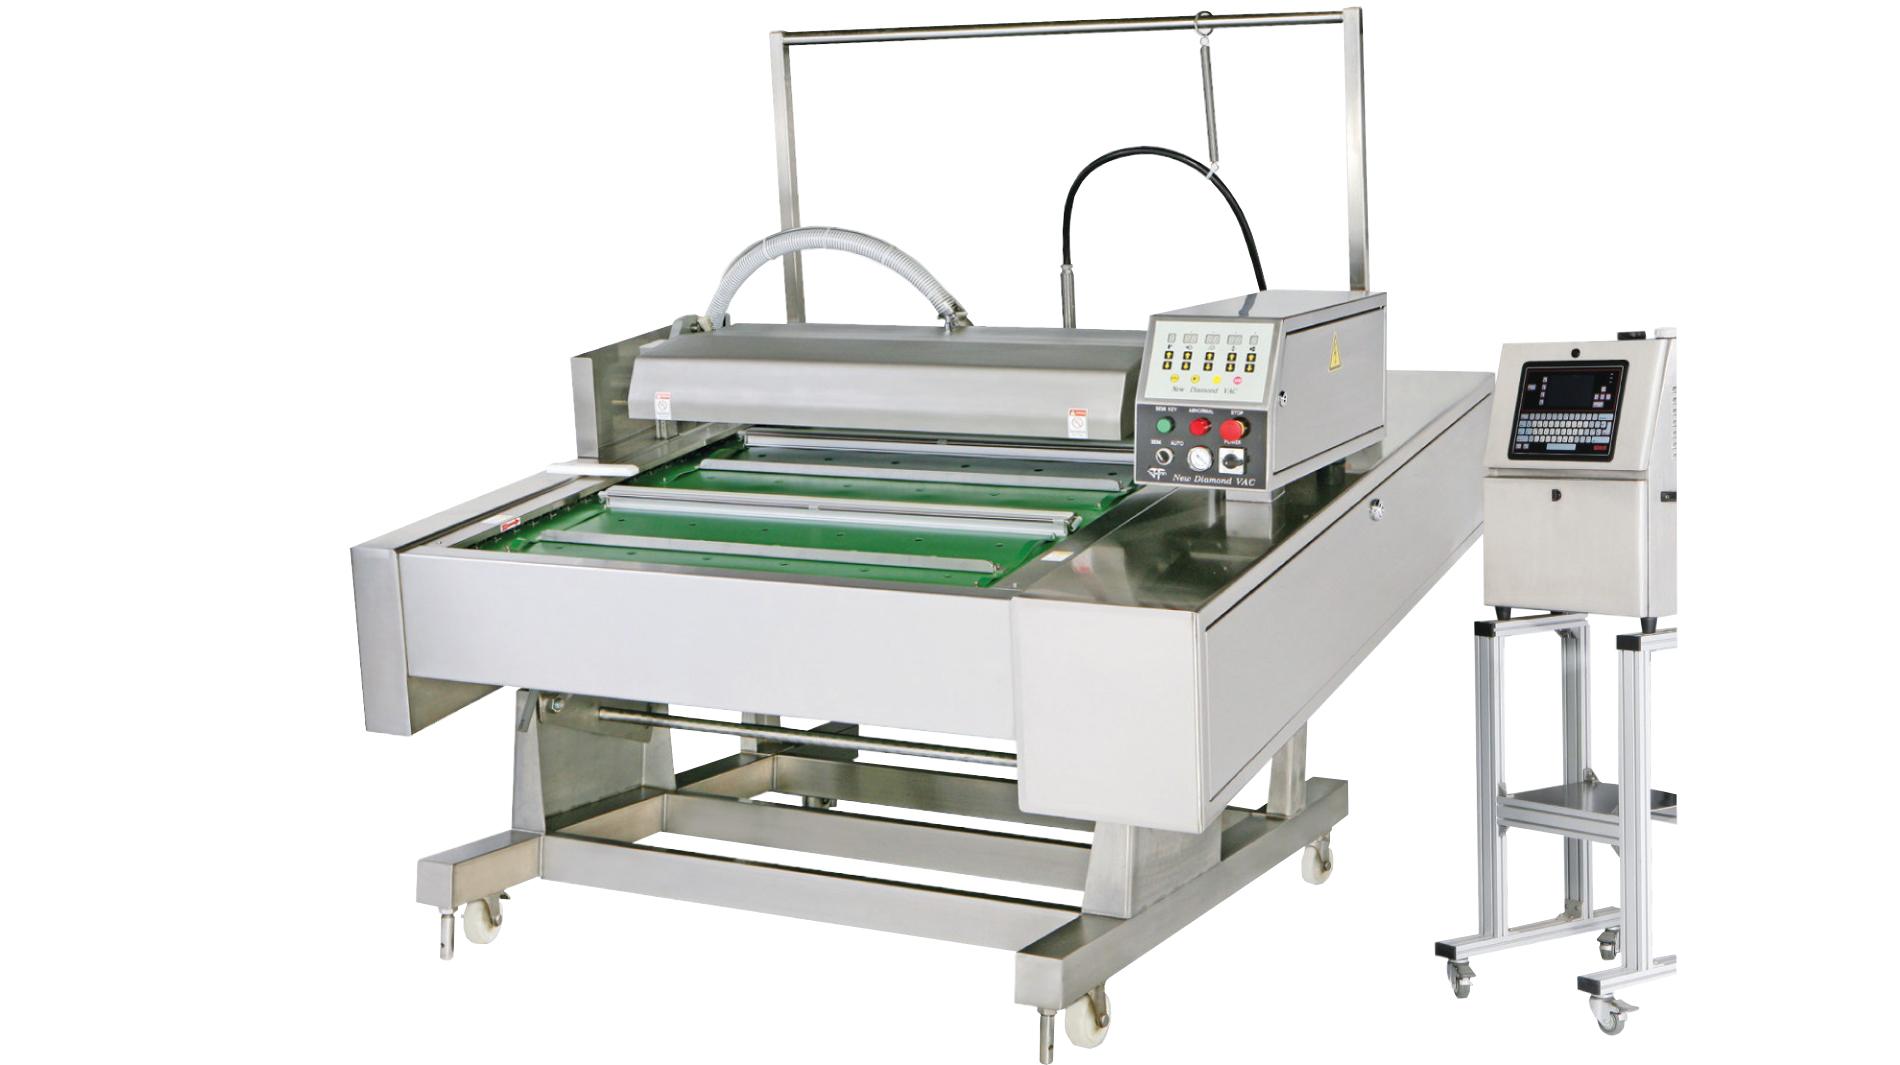 Enjeksiyon Bask? Sistemli Sürekli Bant Tipi Otomatik Vakum Paketleme Makinesi